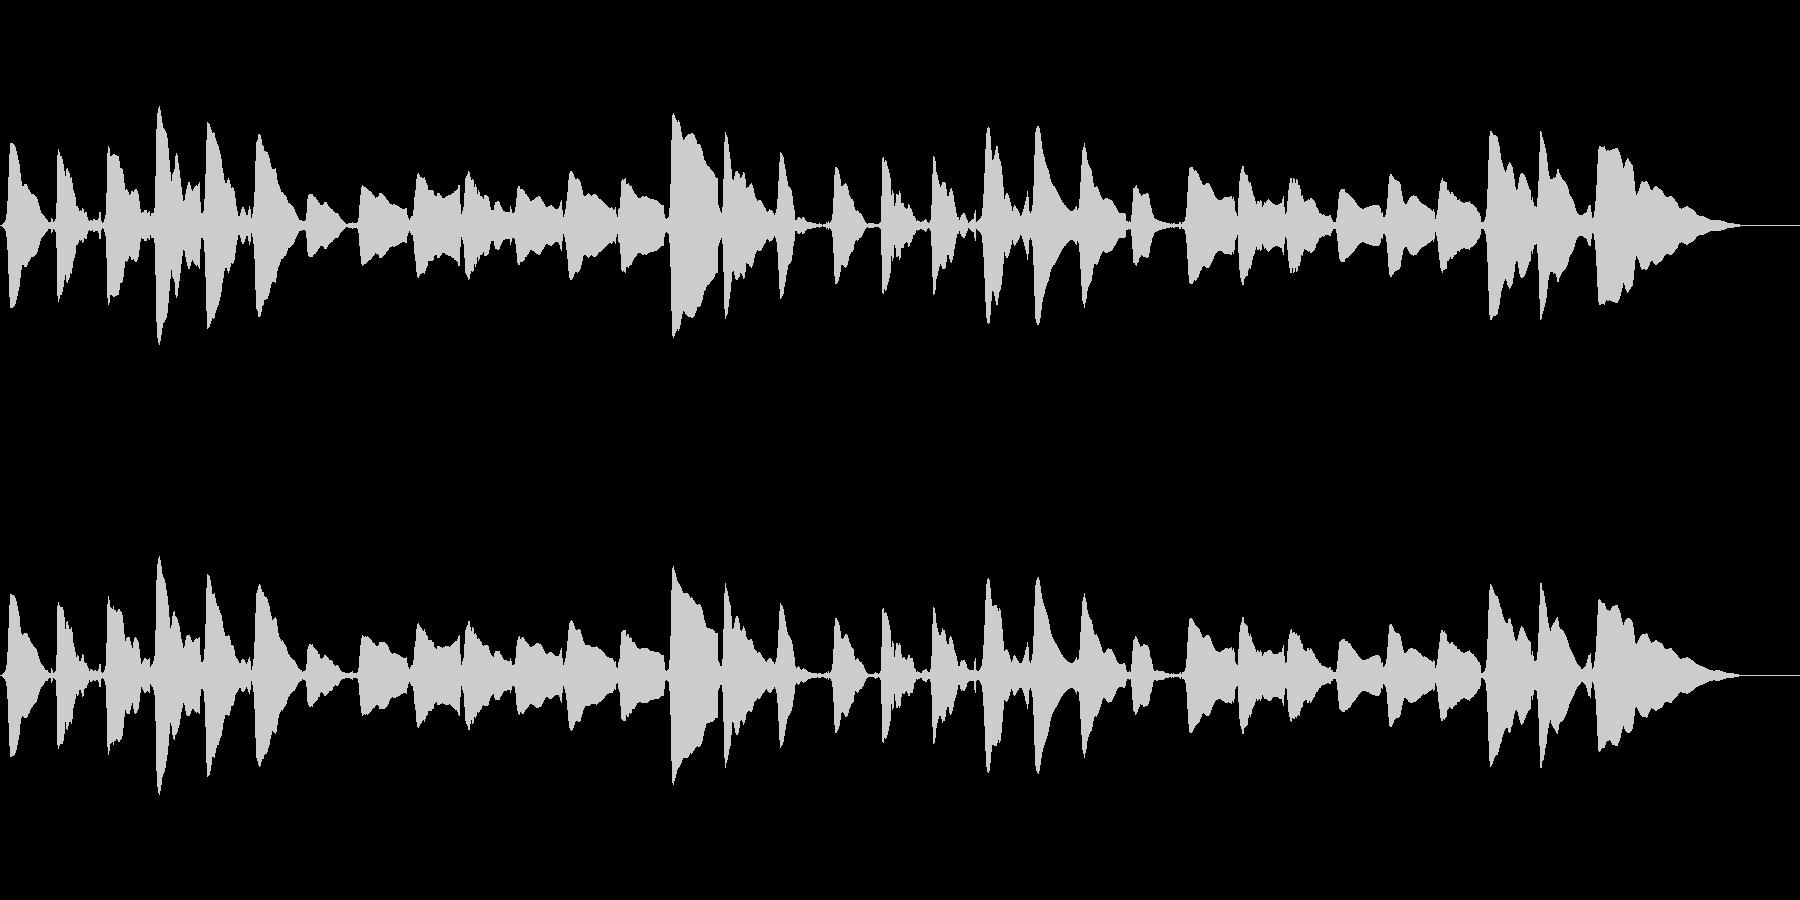 sax一本での切ないメロディーの未再生の波形